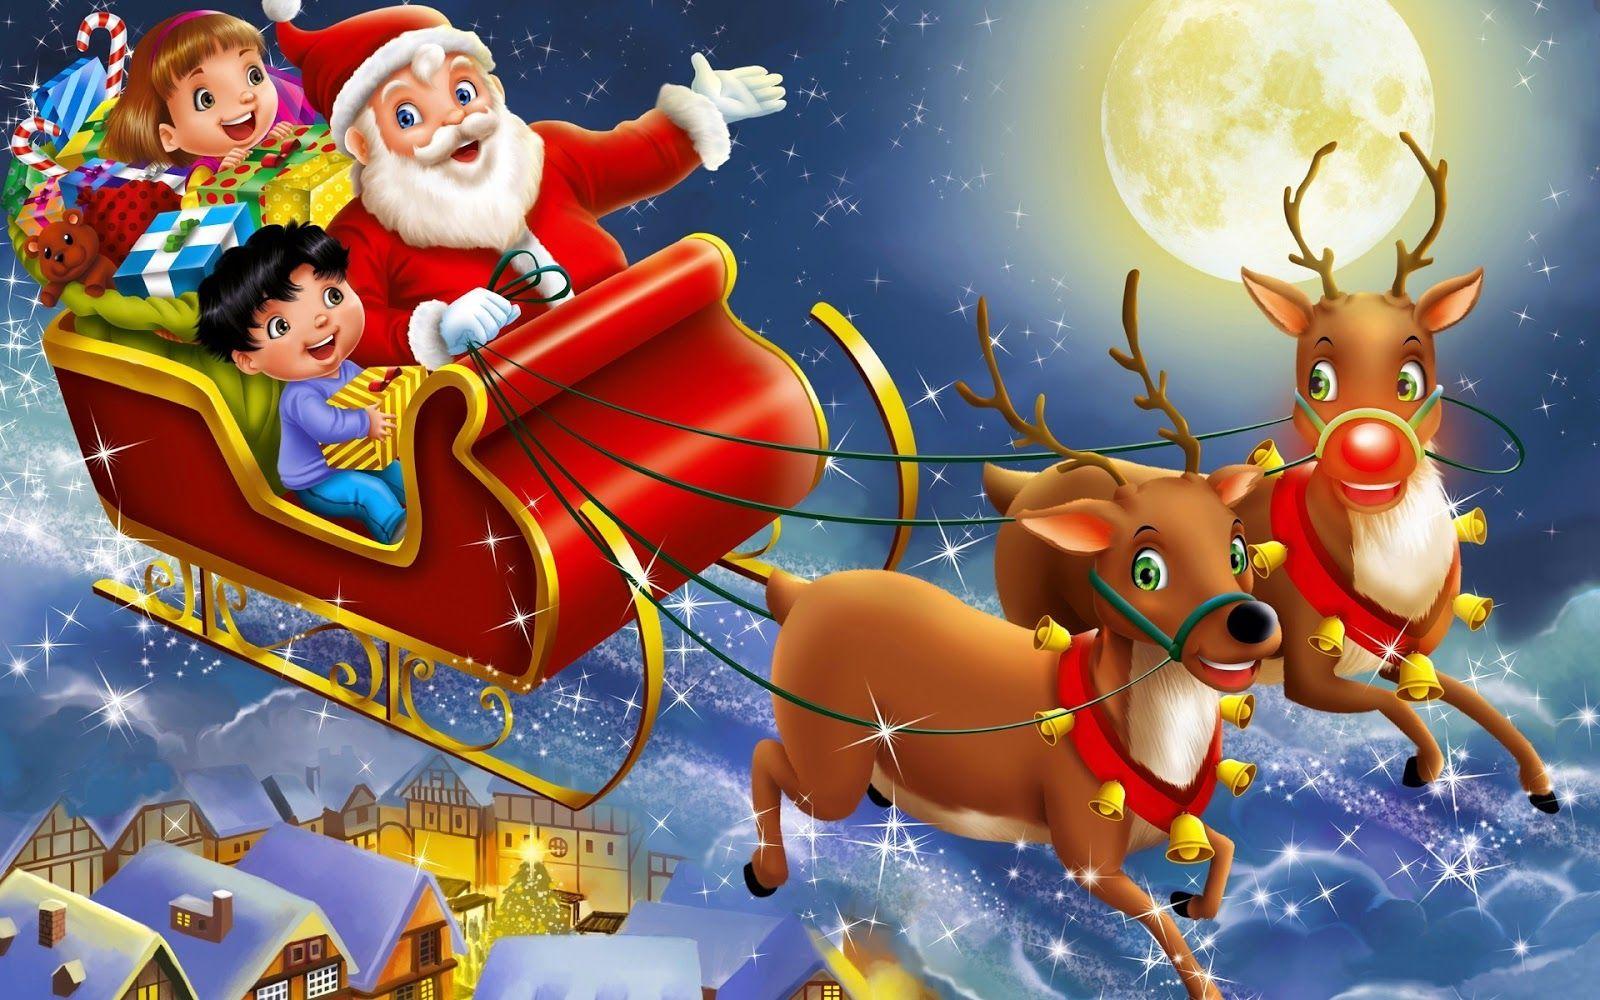 Santa Claus Riding His Sleigh Reindeer With Kids In Sky Hd Wallpaper Jpg Merry Christmas Pictures Santa Claus Wallpaper Christmas Cards Kids